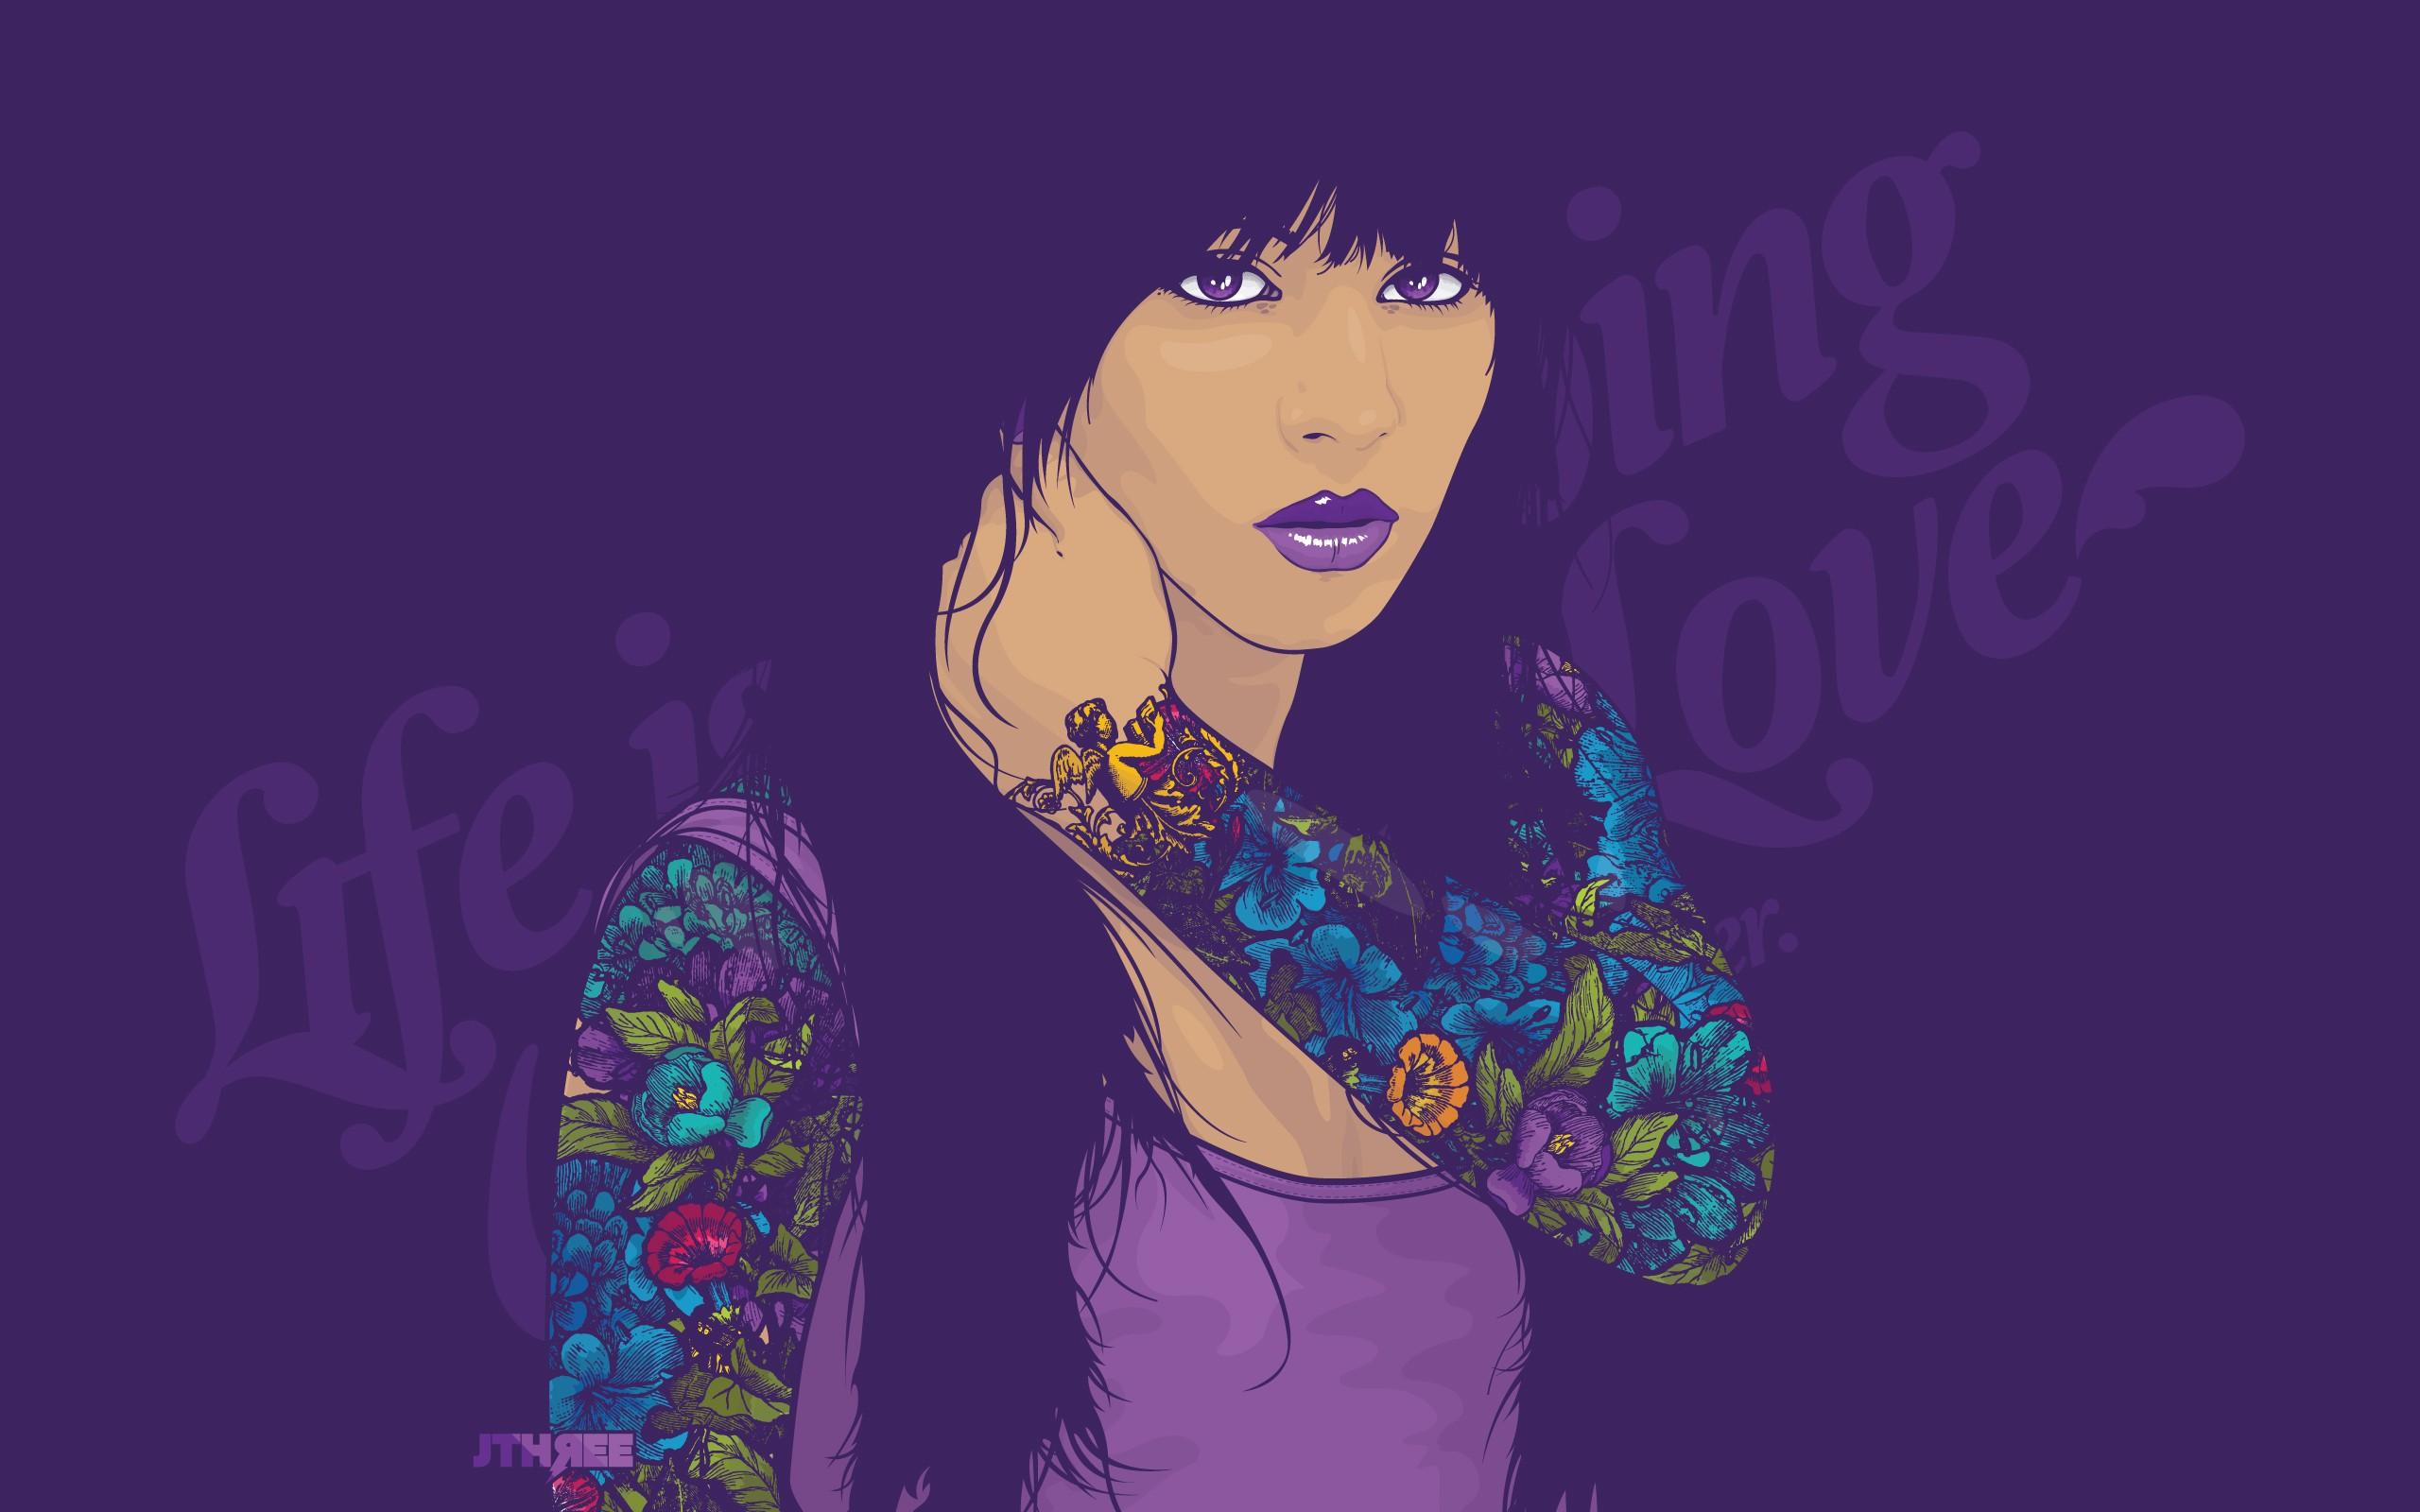 Wallpaper : Face, Illustration, Women, Anime, Purple